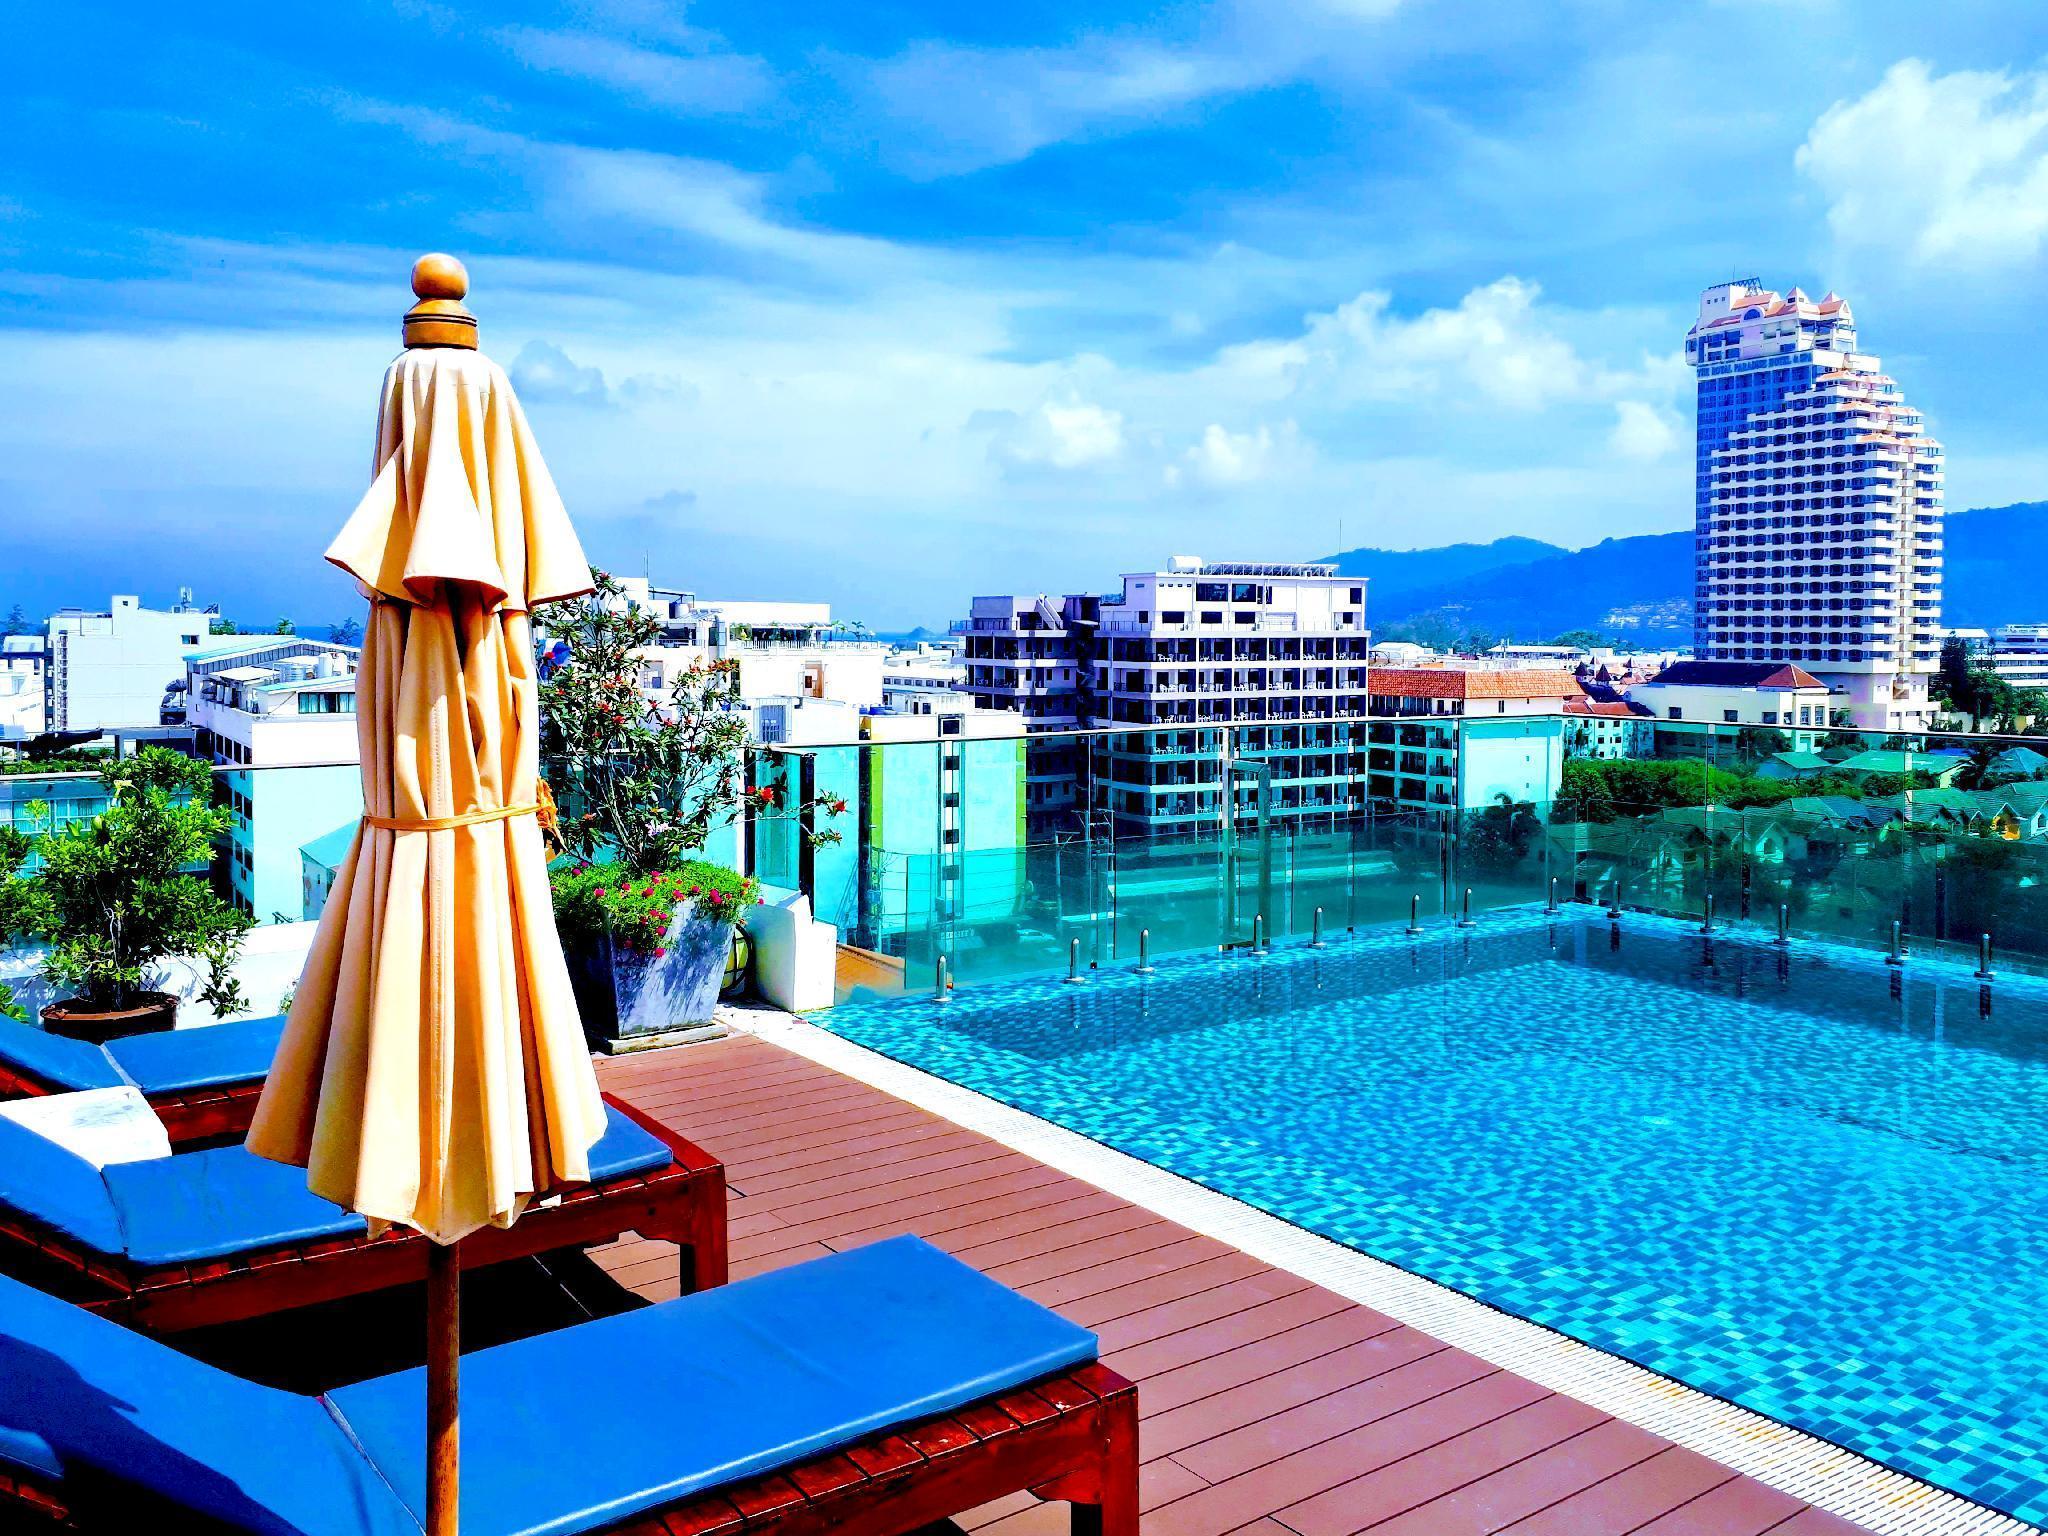 Mirage Express Patong Phuket Hotel โรงแรมมิราจ เอ็กซ์เพรส ป่าตอง ภูเก็ต